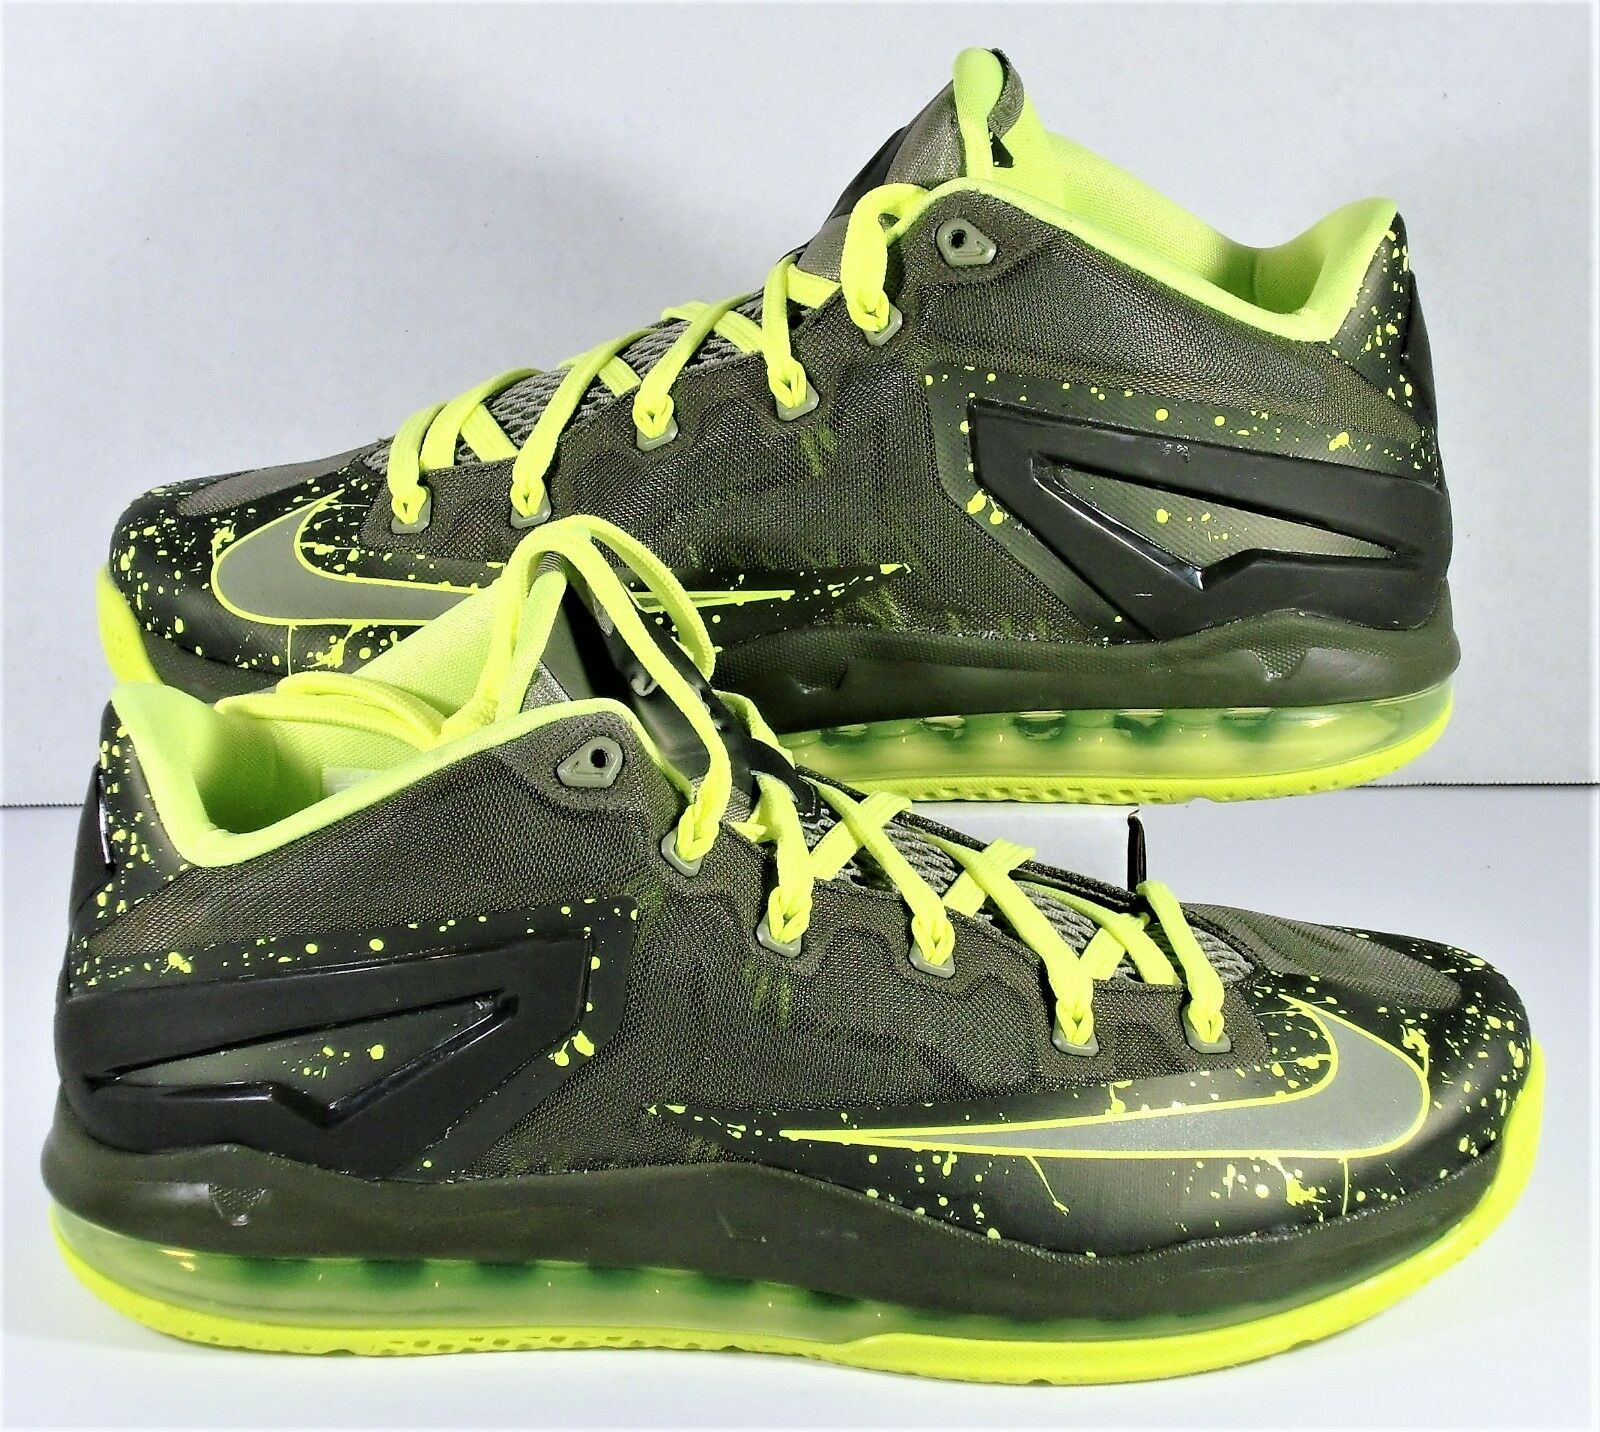 Nike Lebron Air 11 Low Dunkman Air Lebron Max Men Volt Green Shoes Sz 10 NEW 642849-200 8bca06